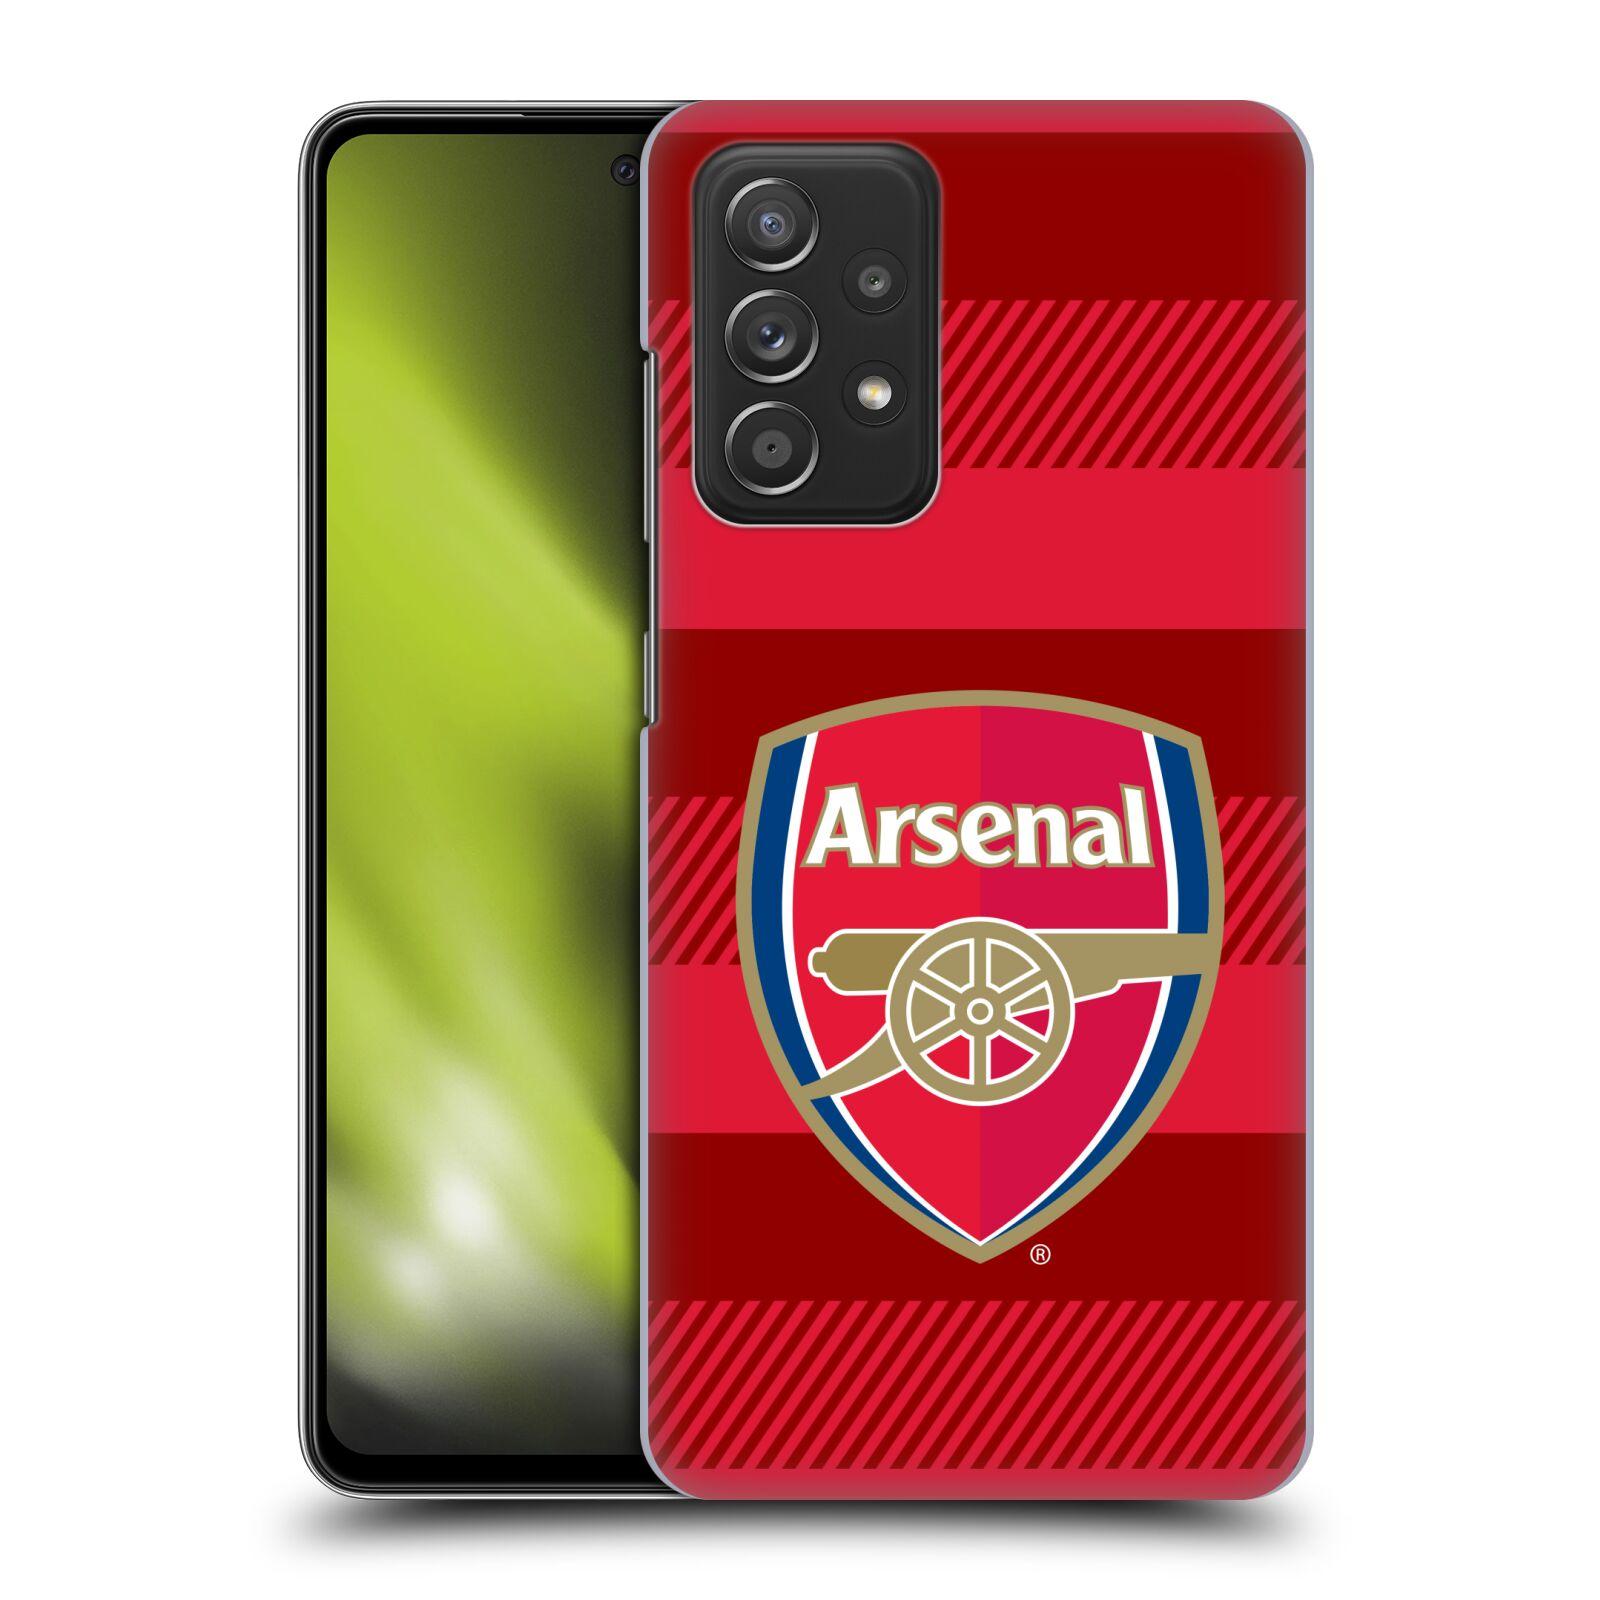 Plastové pouzdro na mobil Samsung Galaxy A52 / A52 5G / A52s 5G - Head Case - Arsenal FC - Logo s pruhy